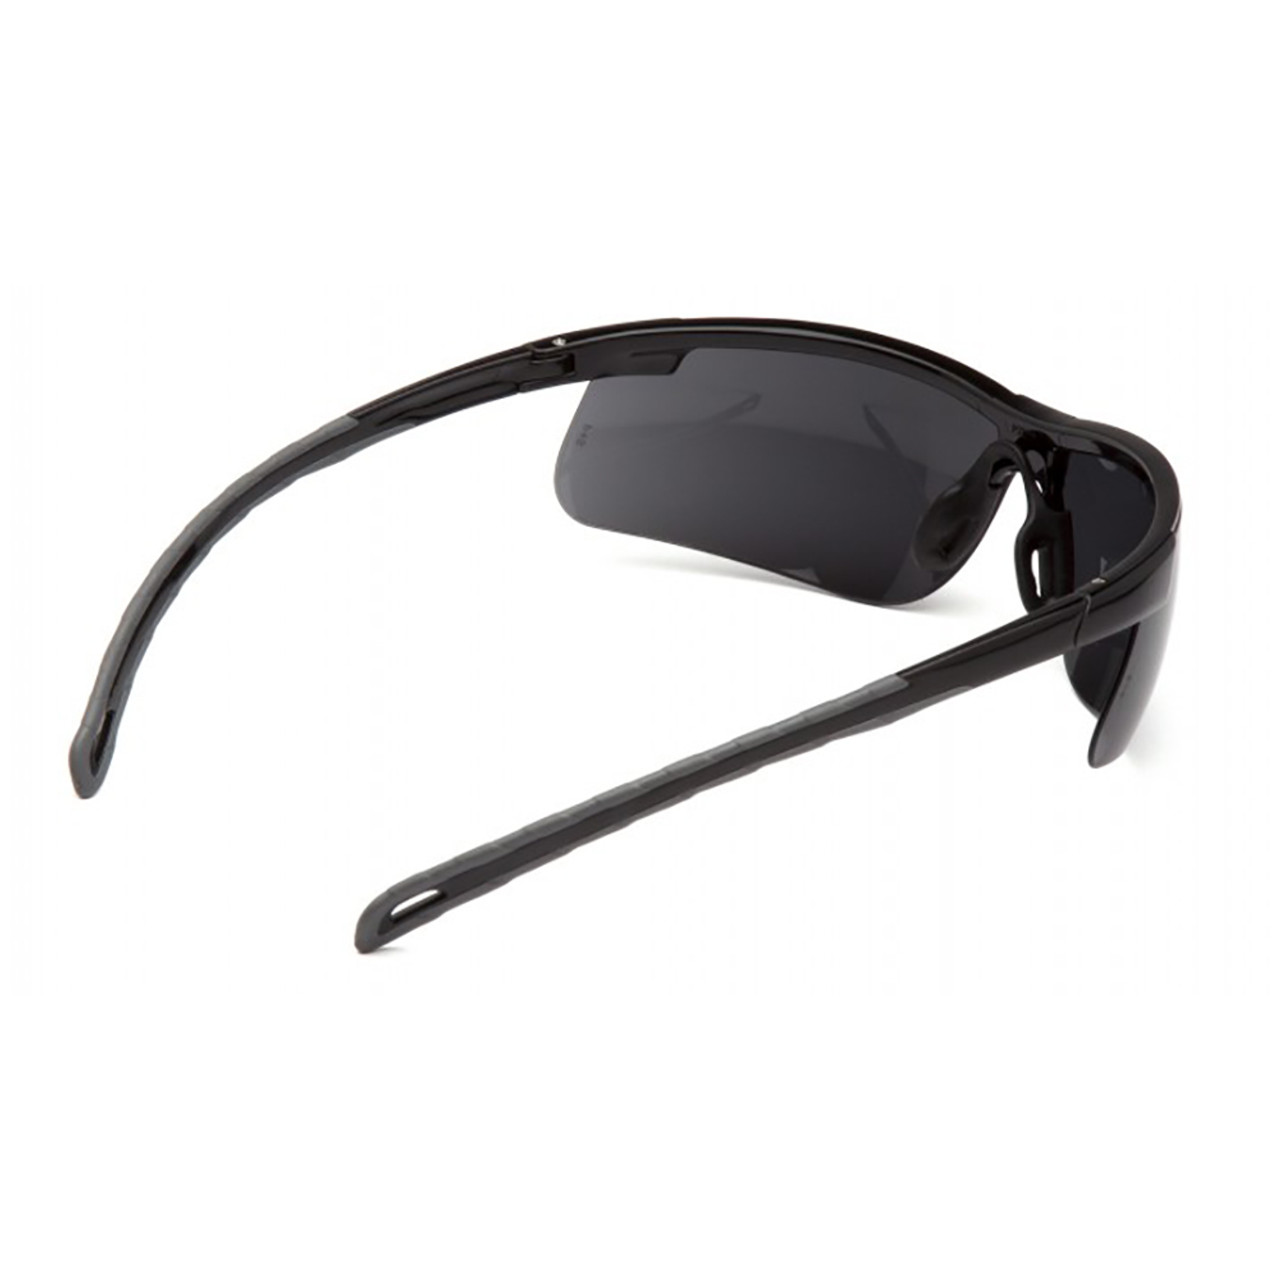 Pyramex Ever-Lite Series Safety Glasses with Dark Lens H2X Anti-Fog Lens and Black Frame